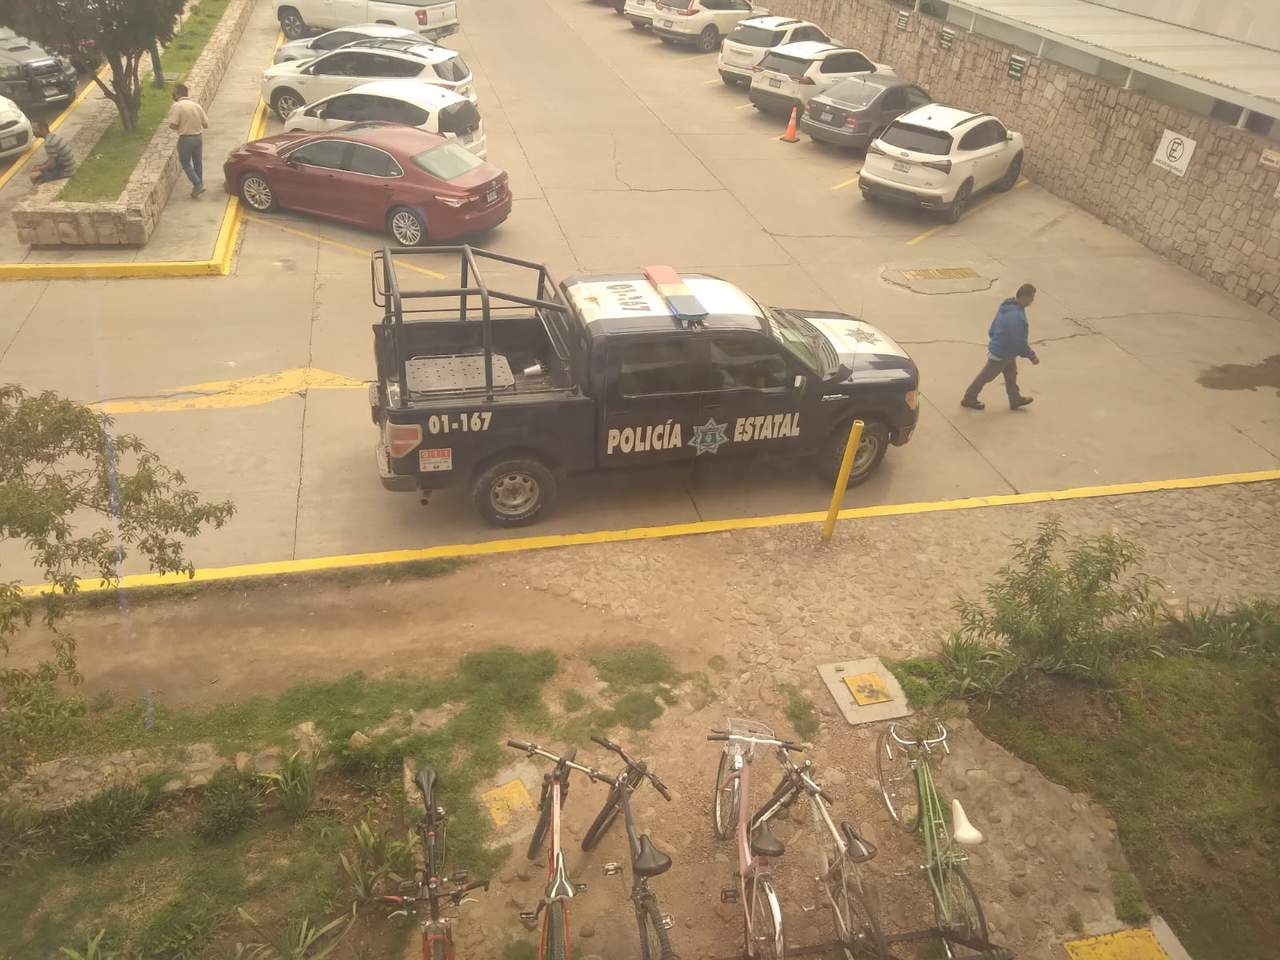 Policía se moviliza en IMSS Durango; acusan a residentes por desaparición de medicamento